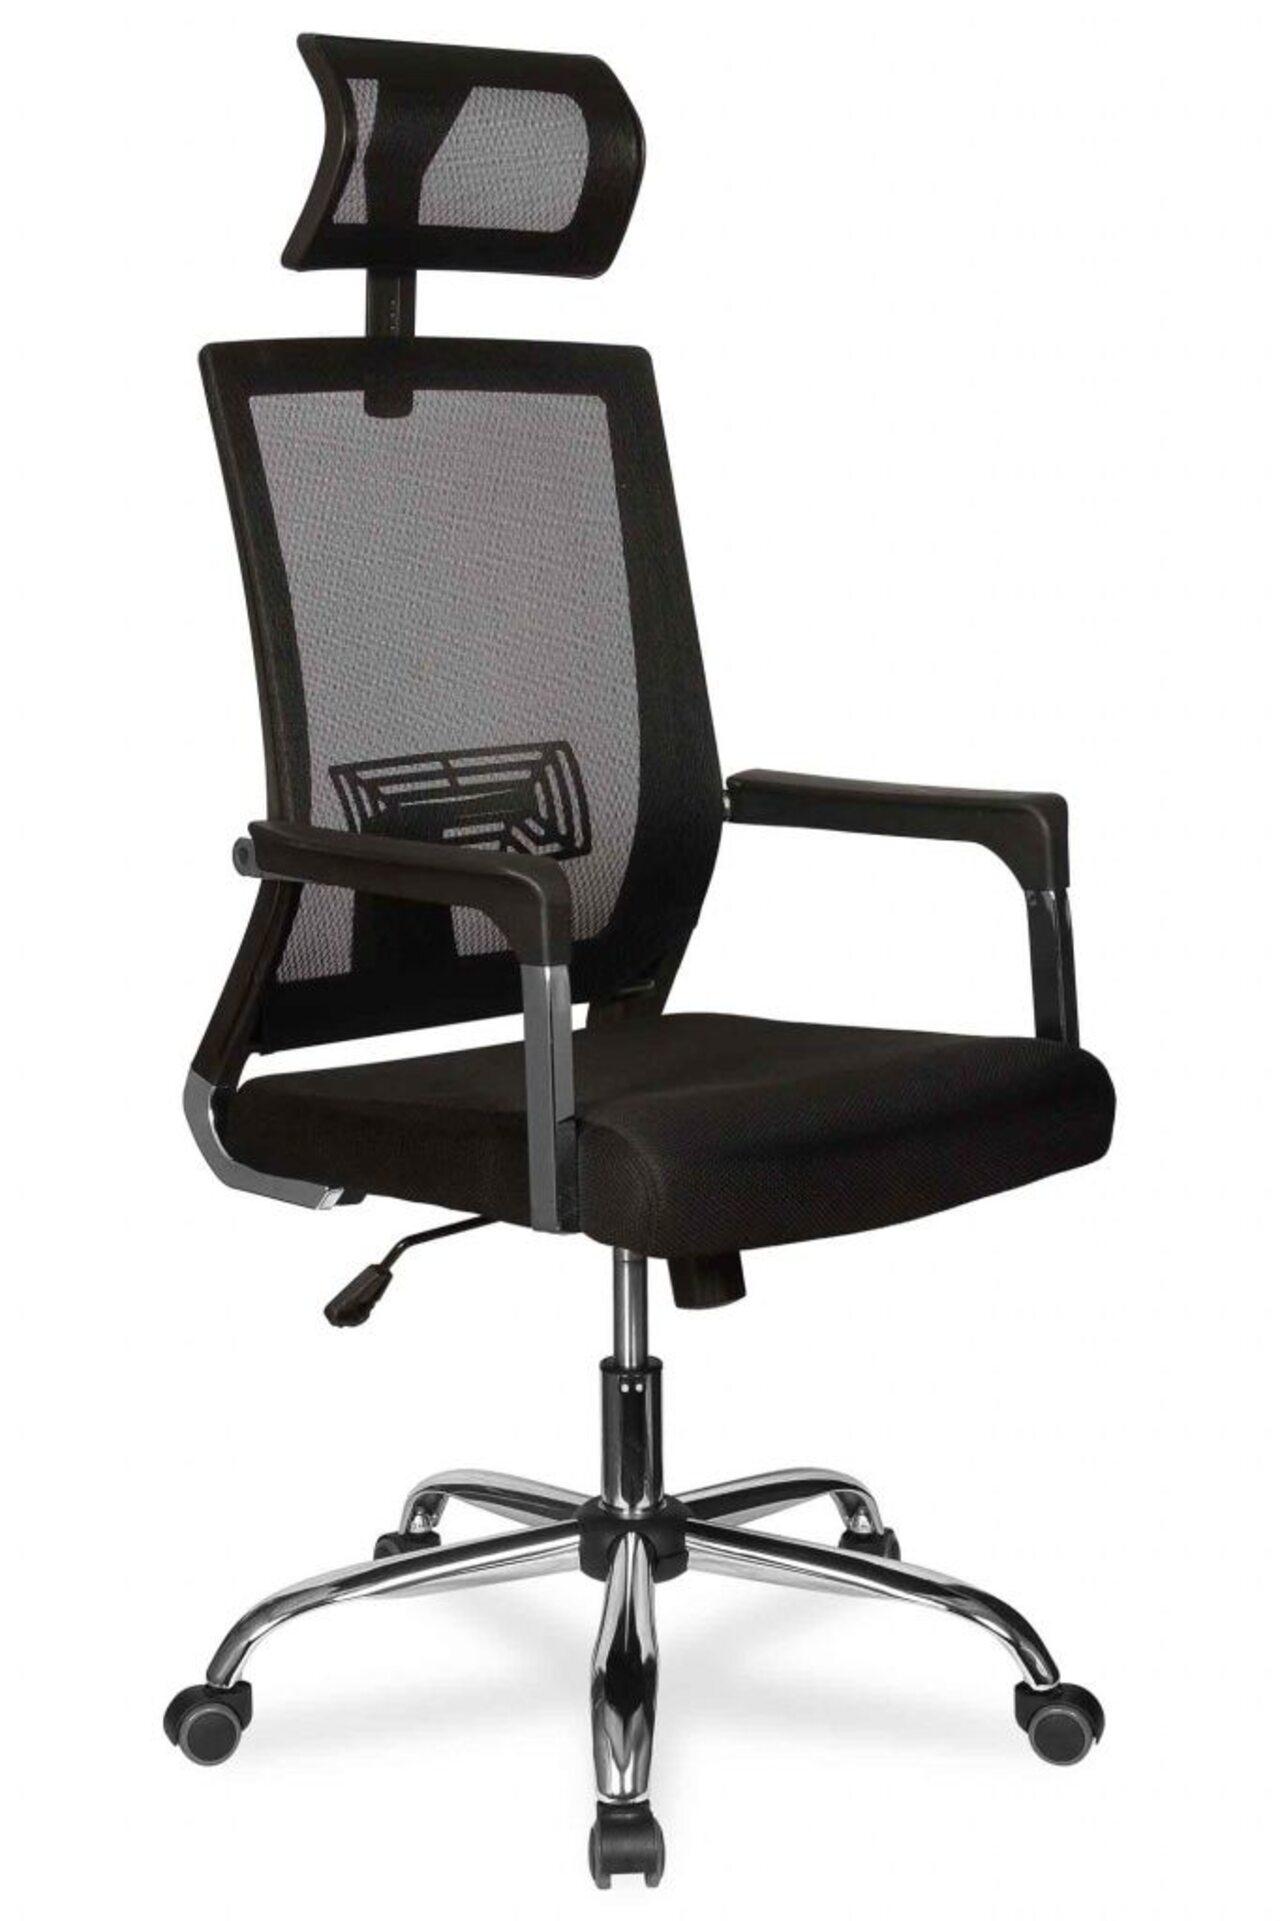 Кресло руководителя College CLG-423 MXH-A - фото 1